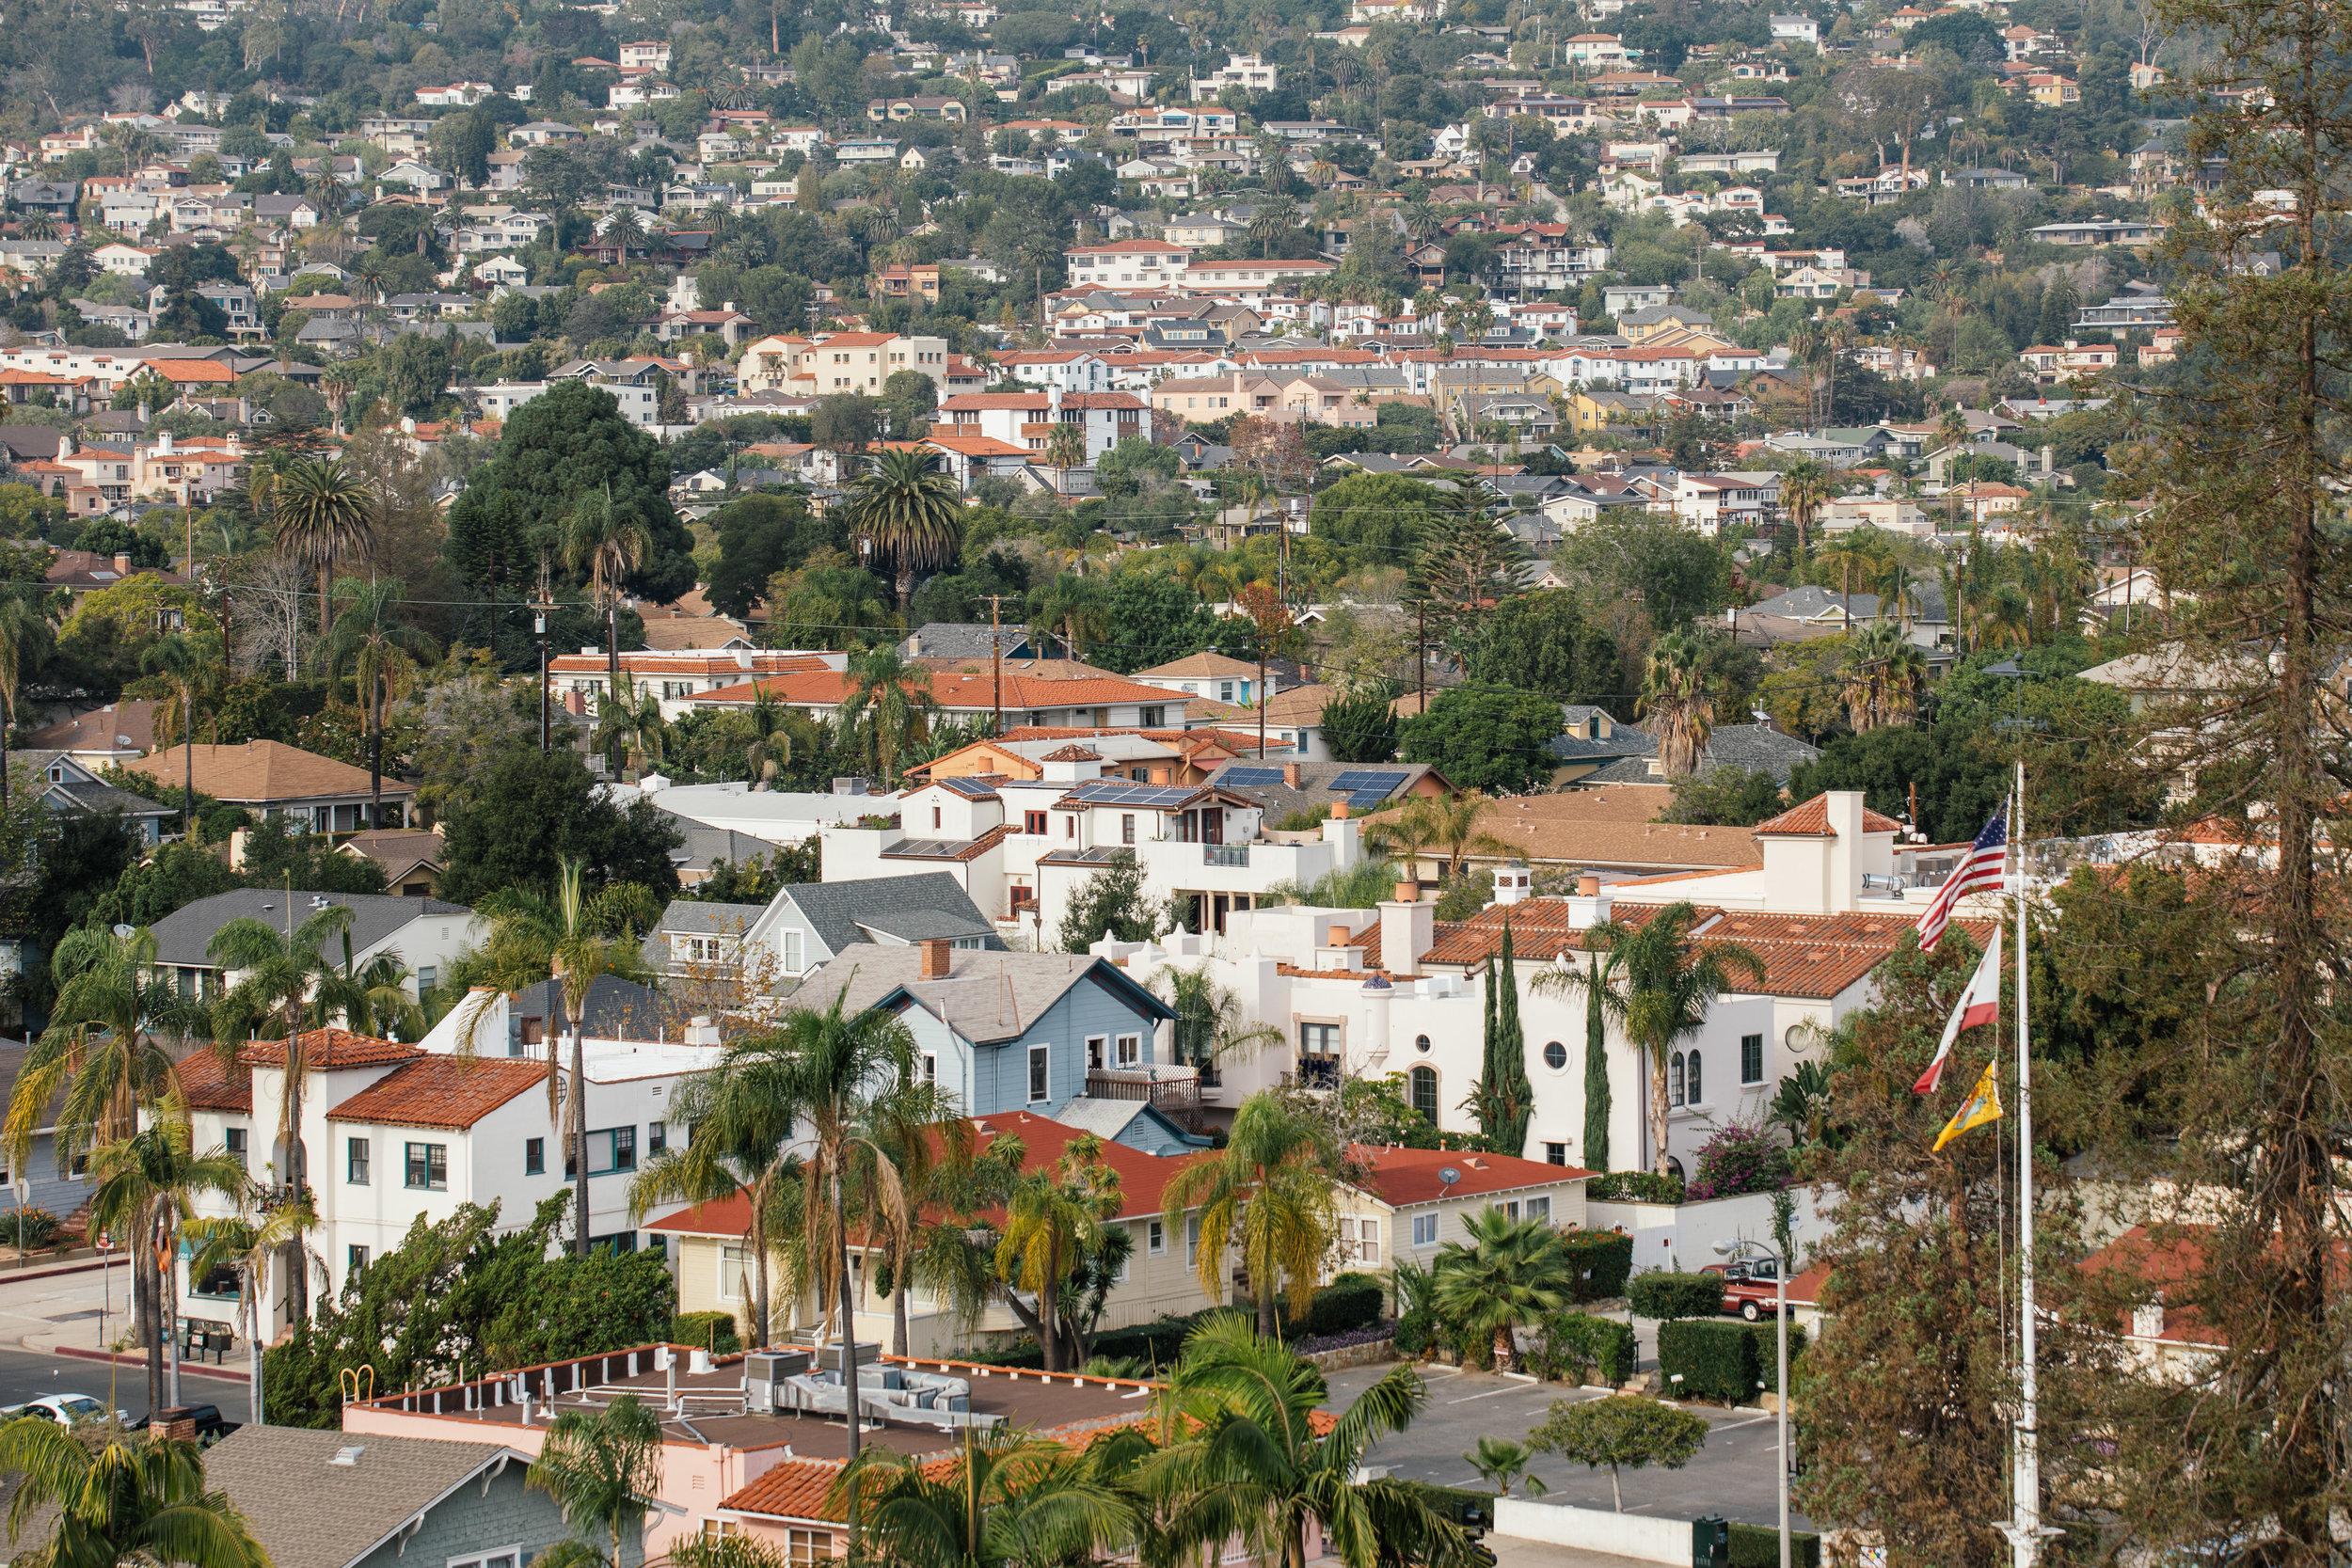 downtown-santa-barbara-travel-lifestyle-real-estate-1.jpg